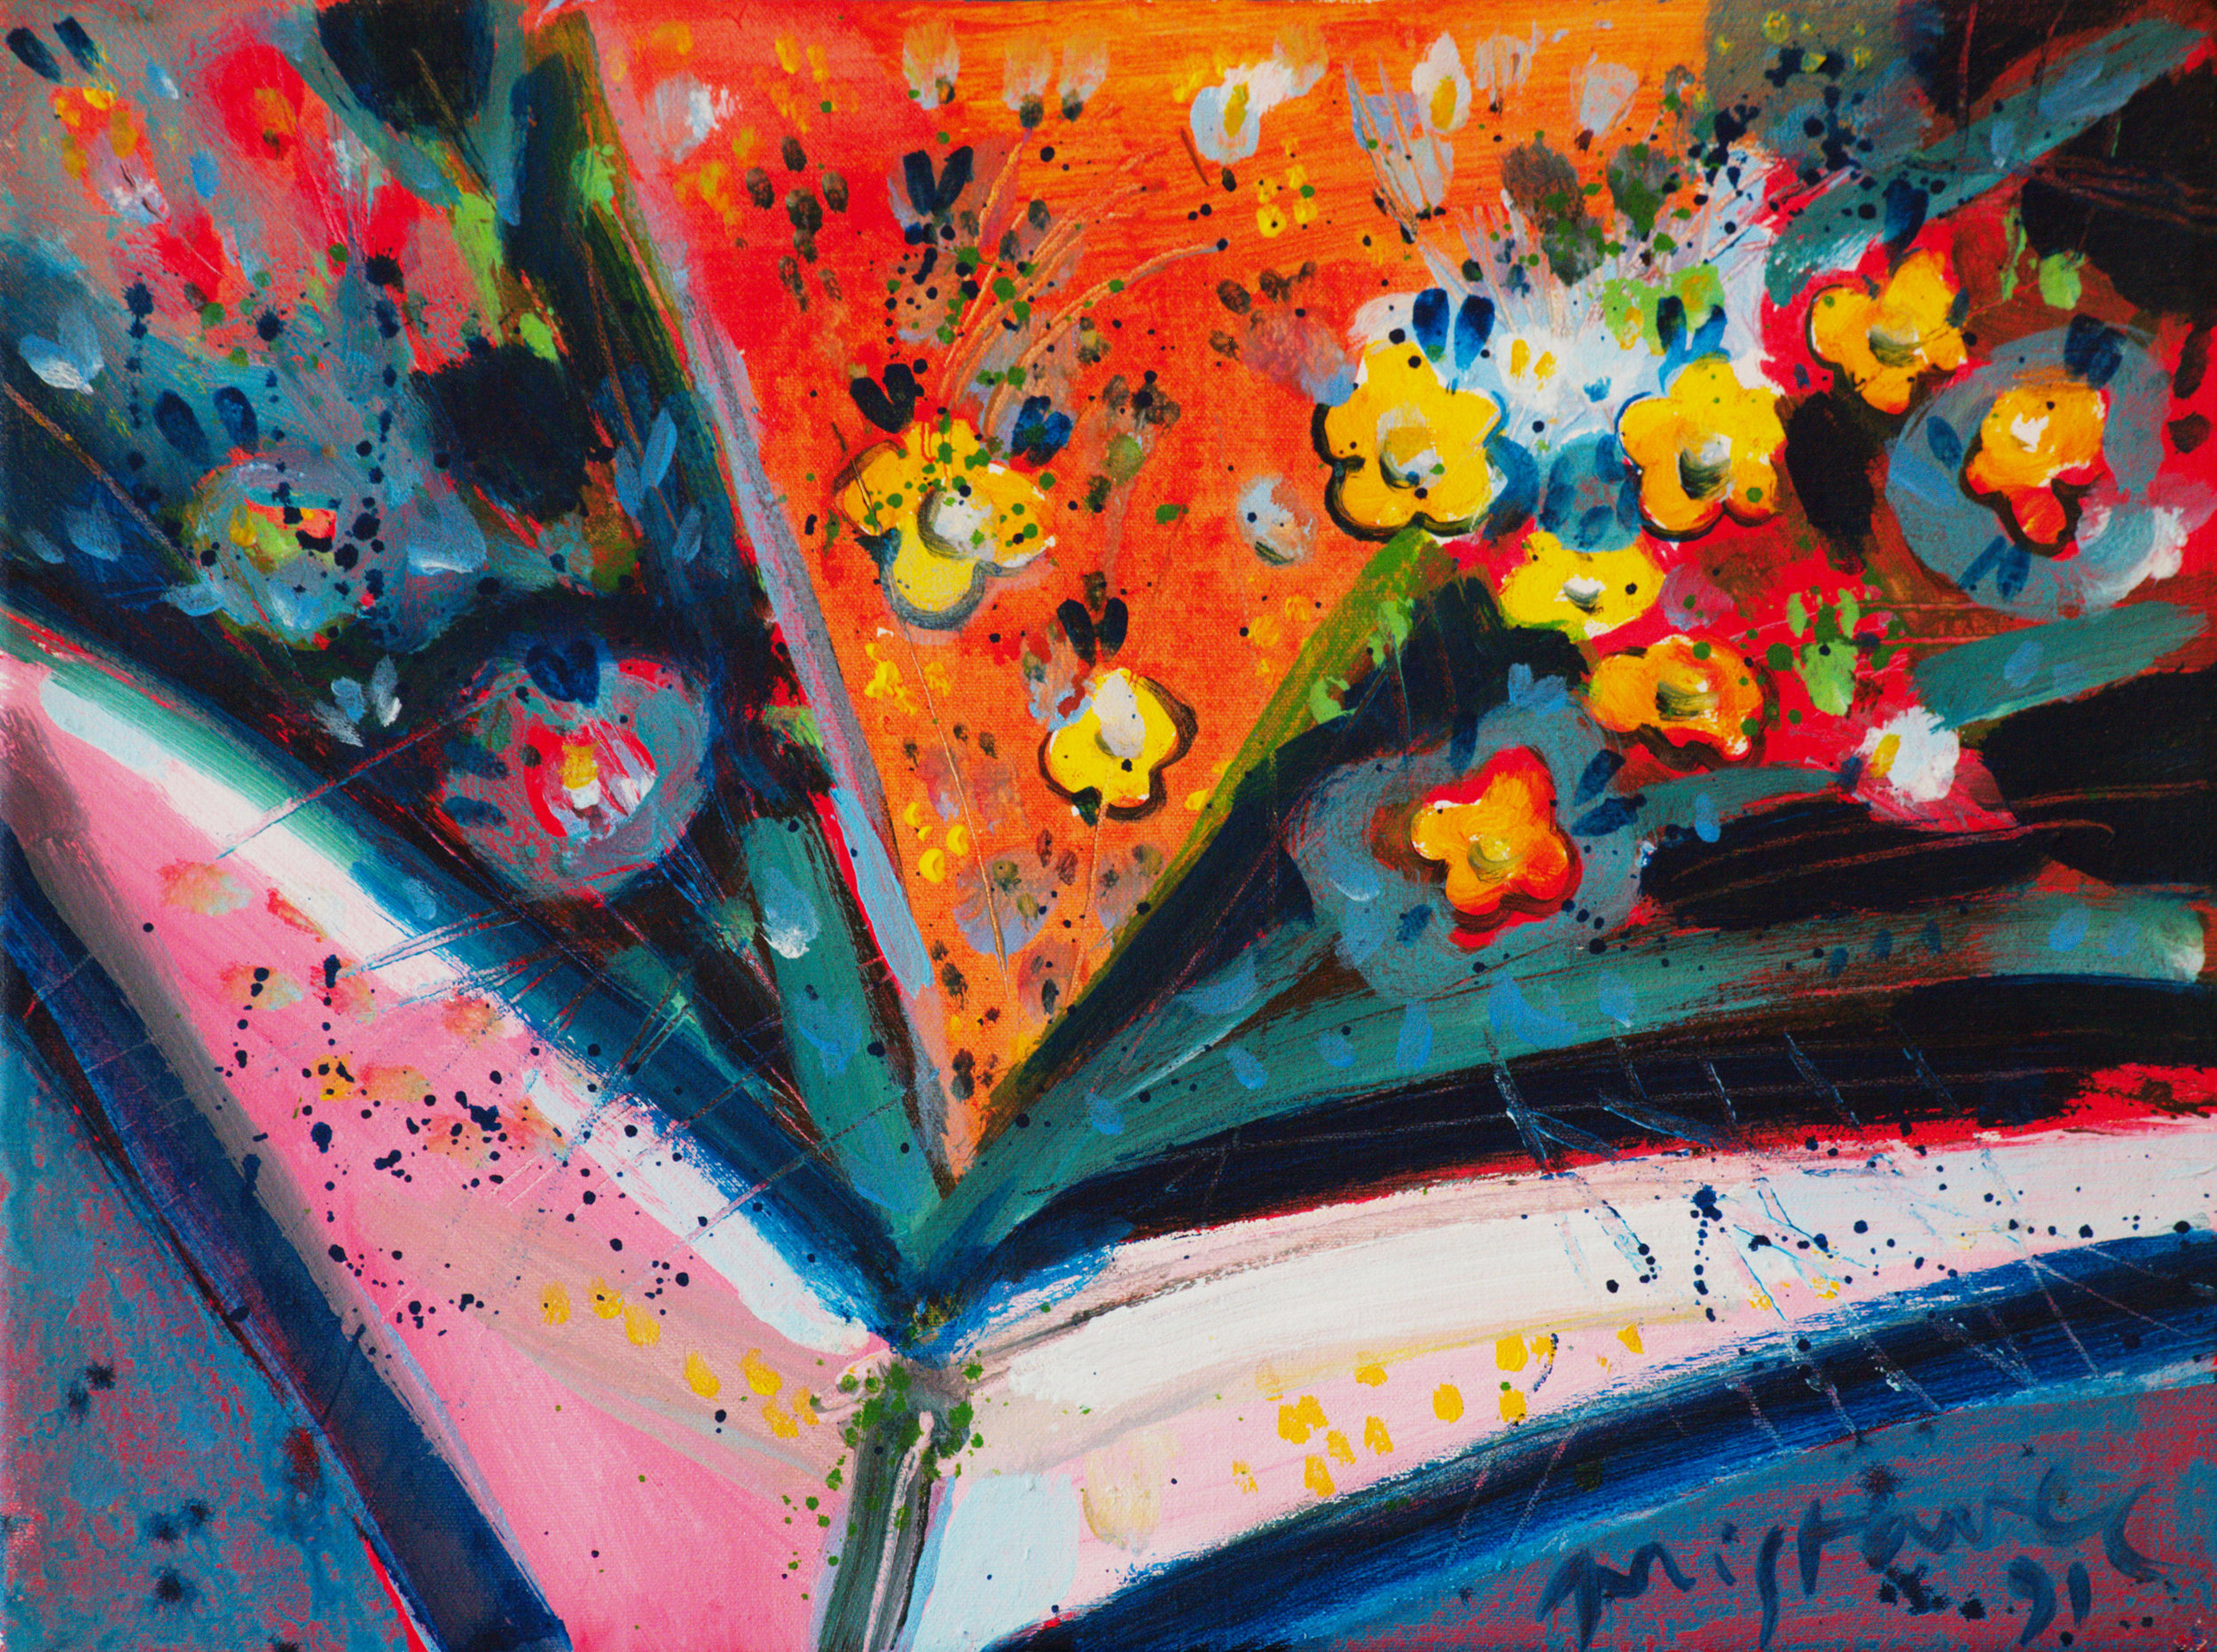 Still Life VII / 1991 /oil on canvas / 38x28 cm